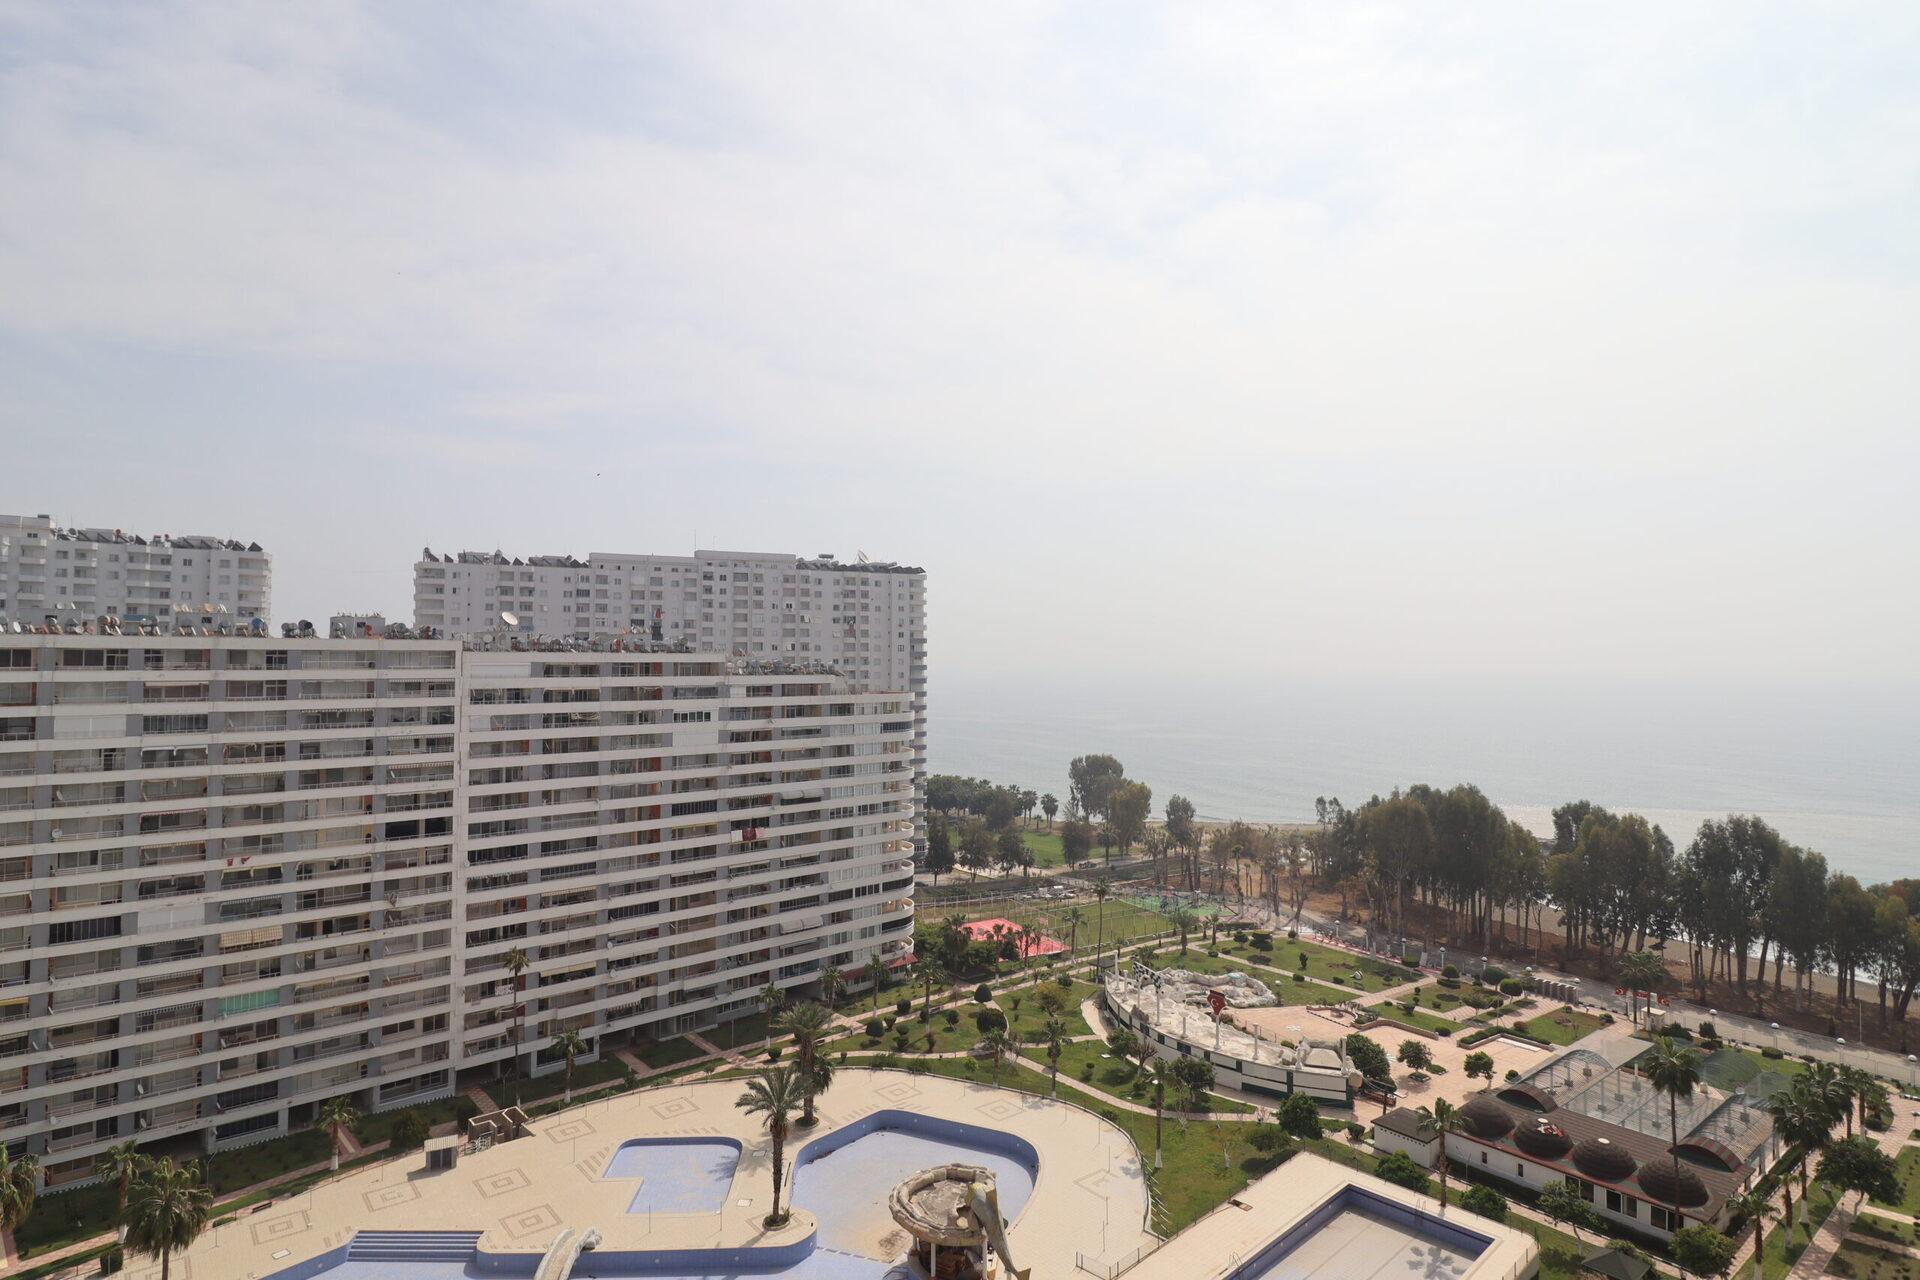 Mersin Erdemli Tömük Doğan Aquapark Sitesi Affordable 2 + 1 Summer Apartment For Sale